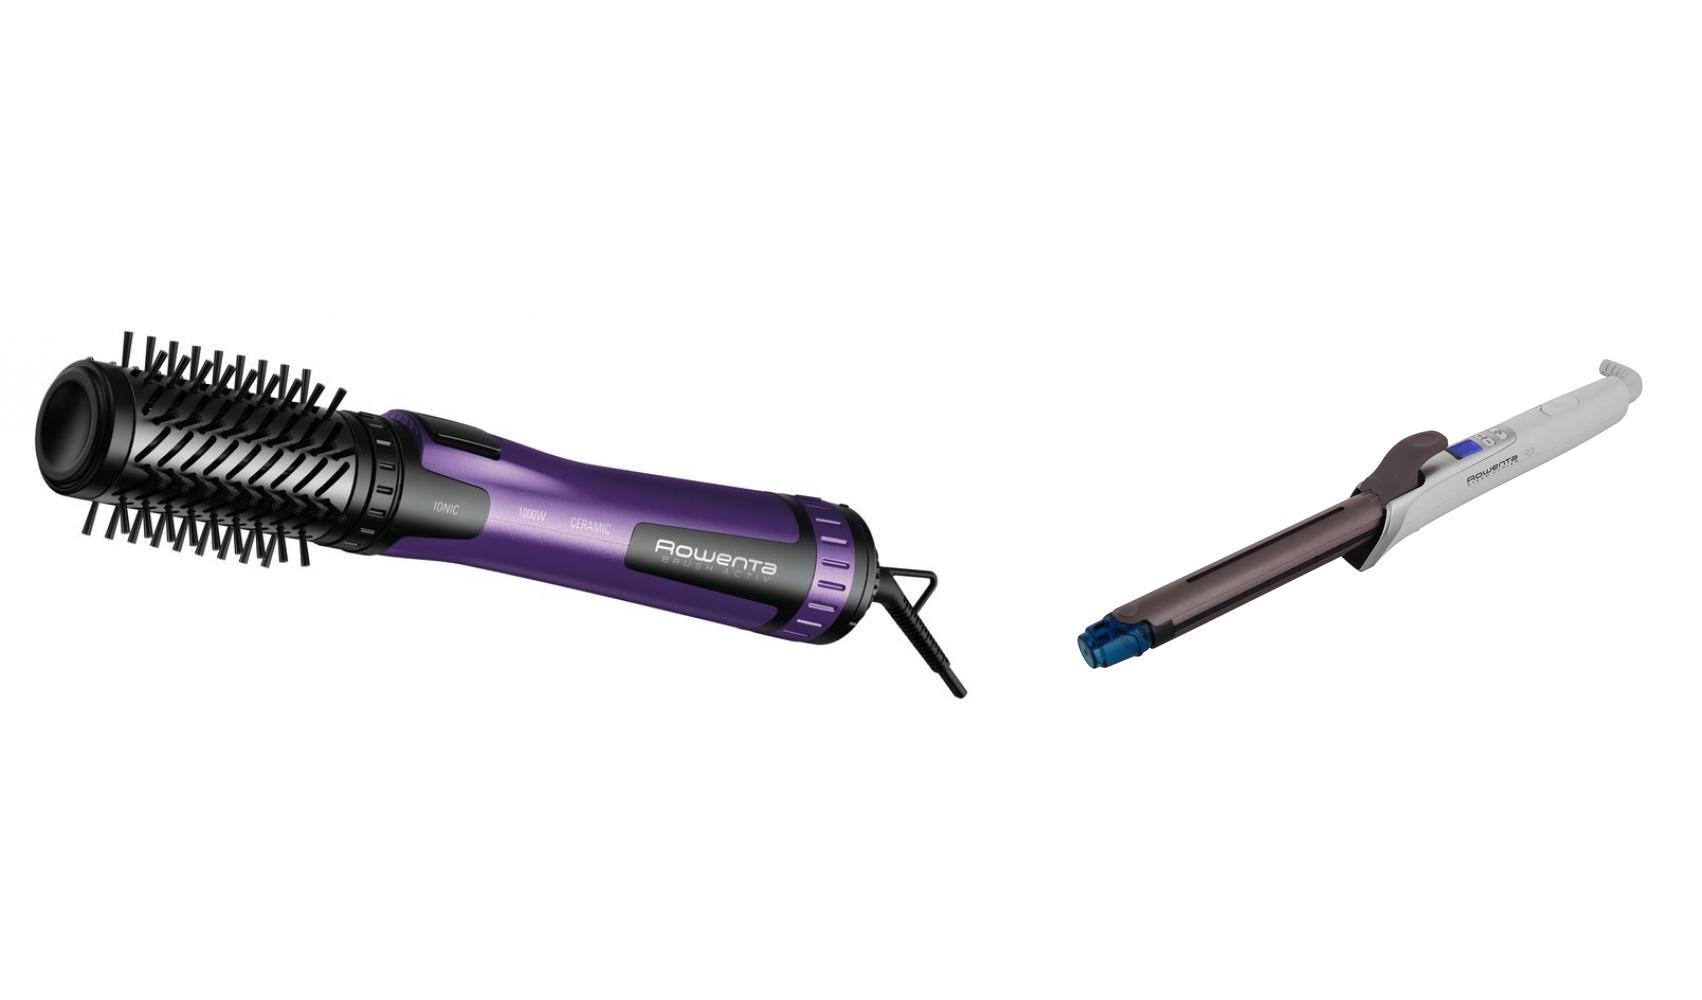 Комплект Фен-щетка Rowenta Brush Activ Compact CF9524 + Электрощипцы Rowenta CF3810 фото